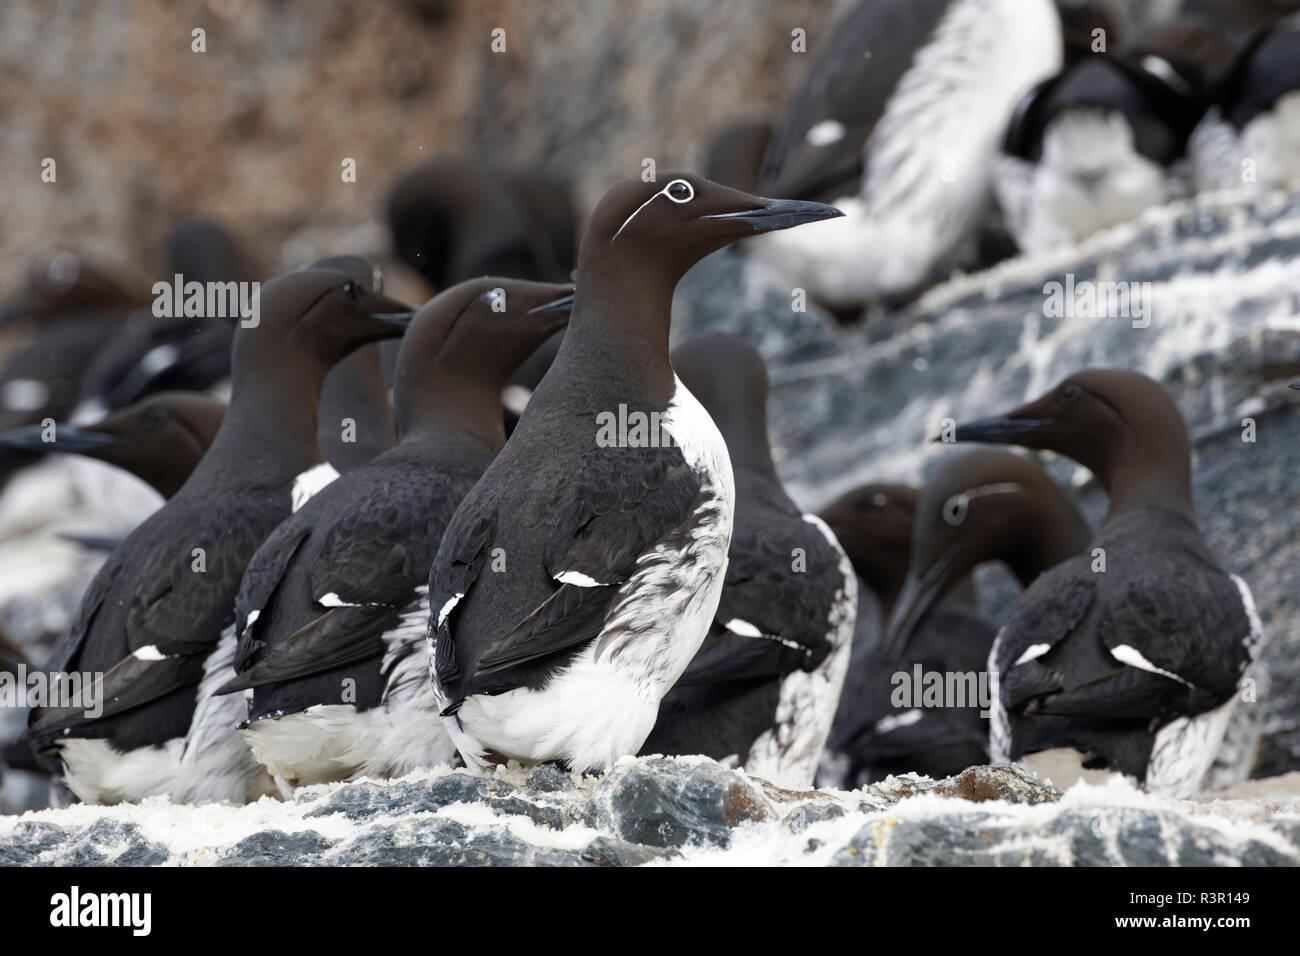 Common Guillemots (Uria aalge) on Hornoya Island, Varanger, Norway Stock Photo